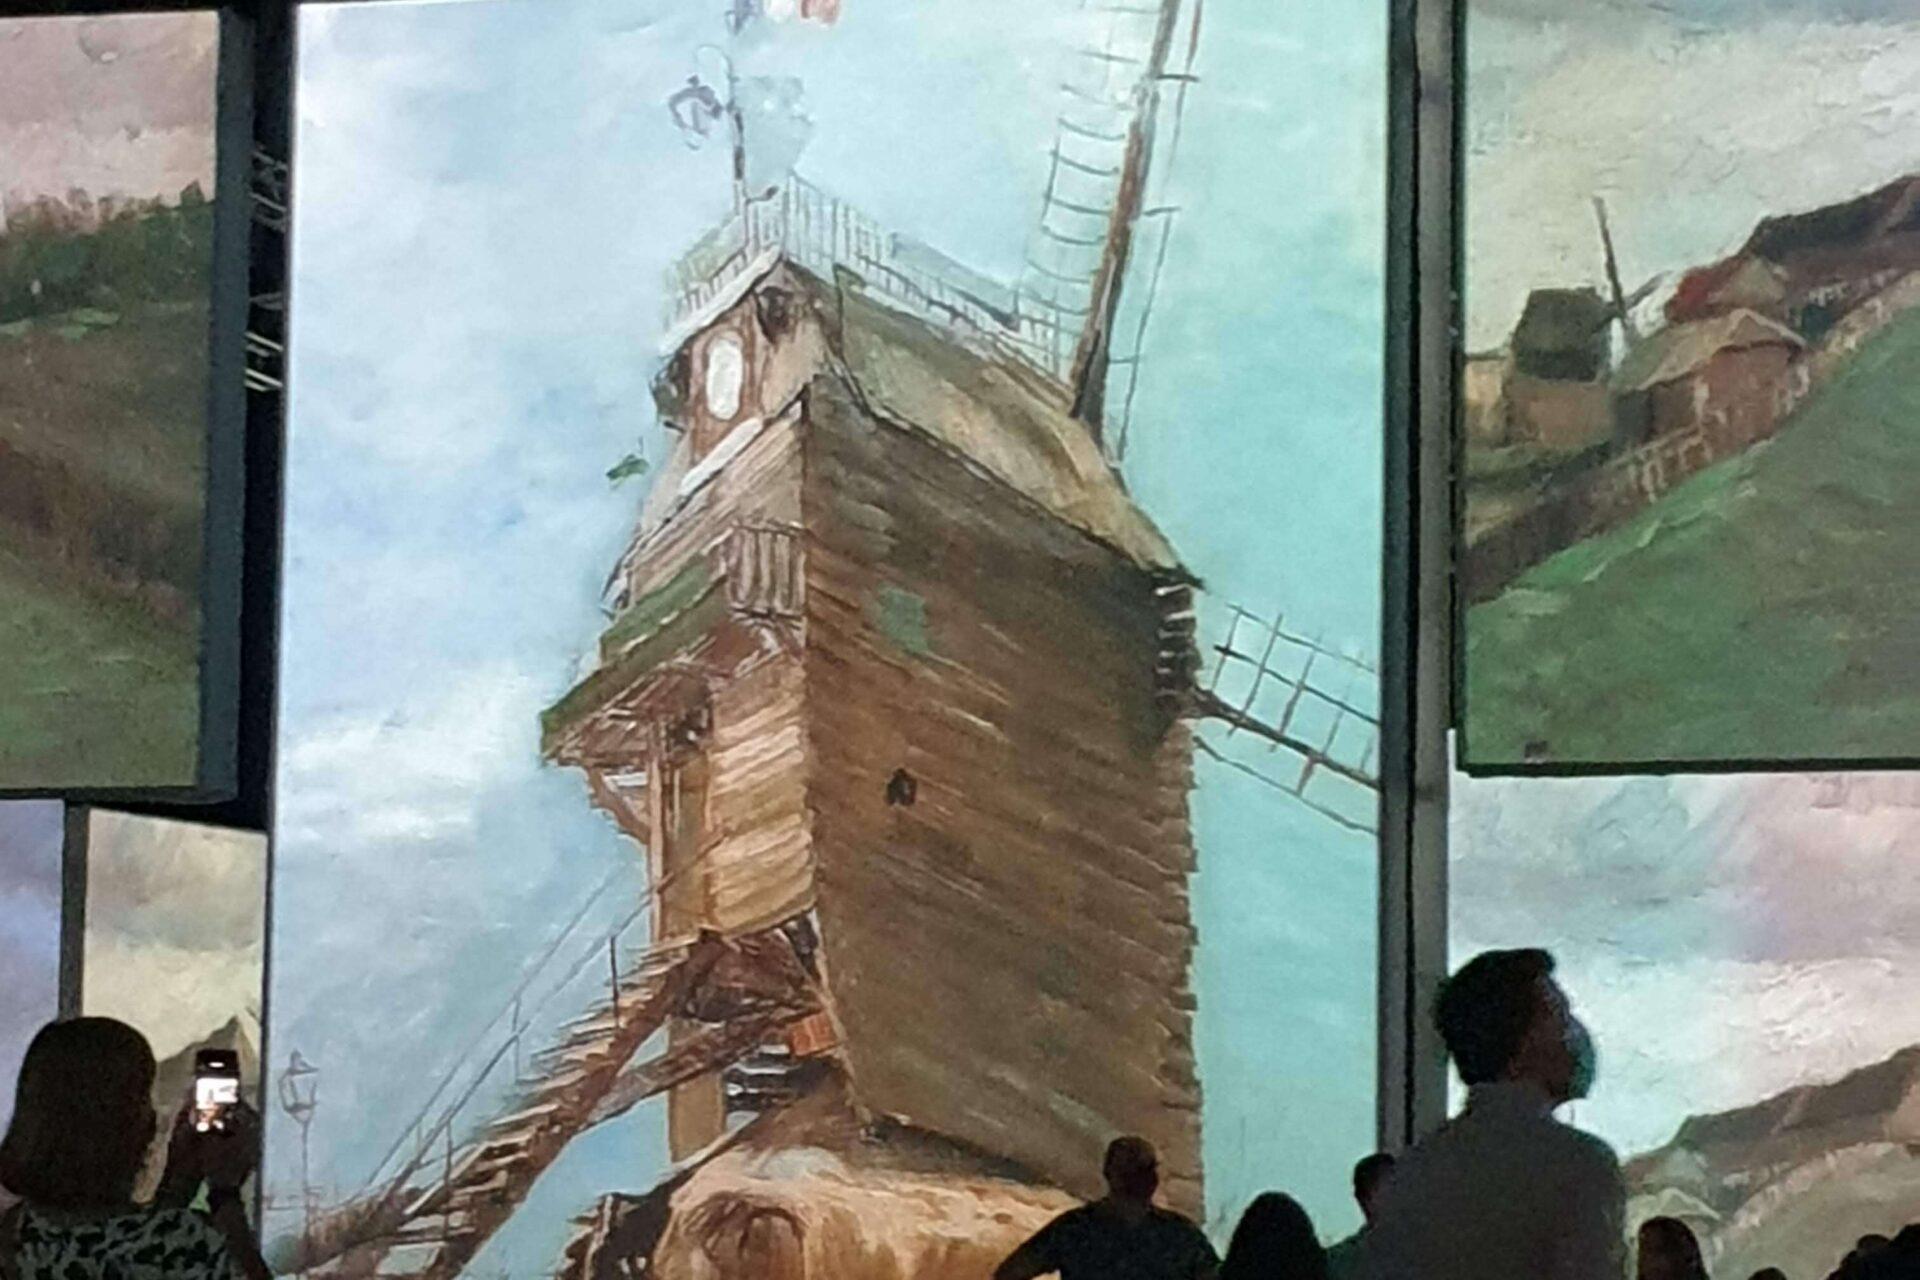 Van Gogh on the big screen